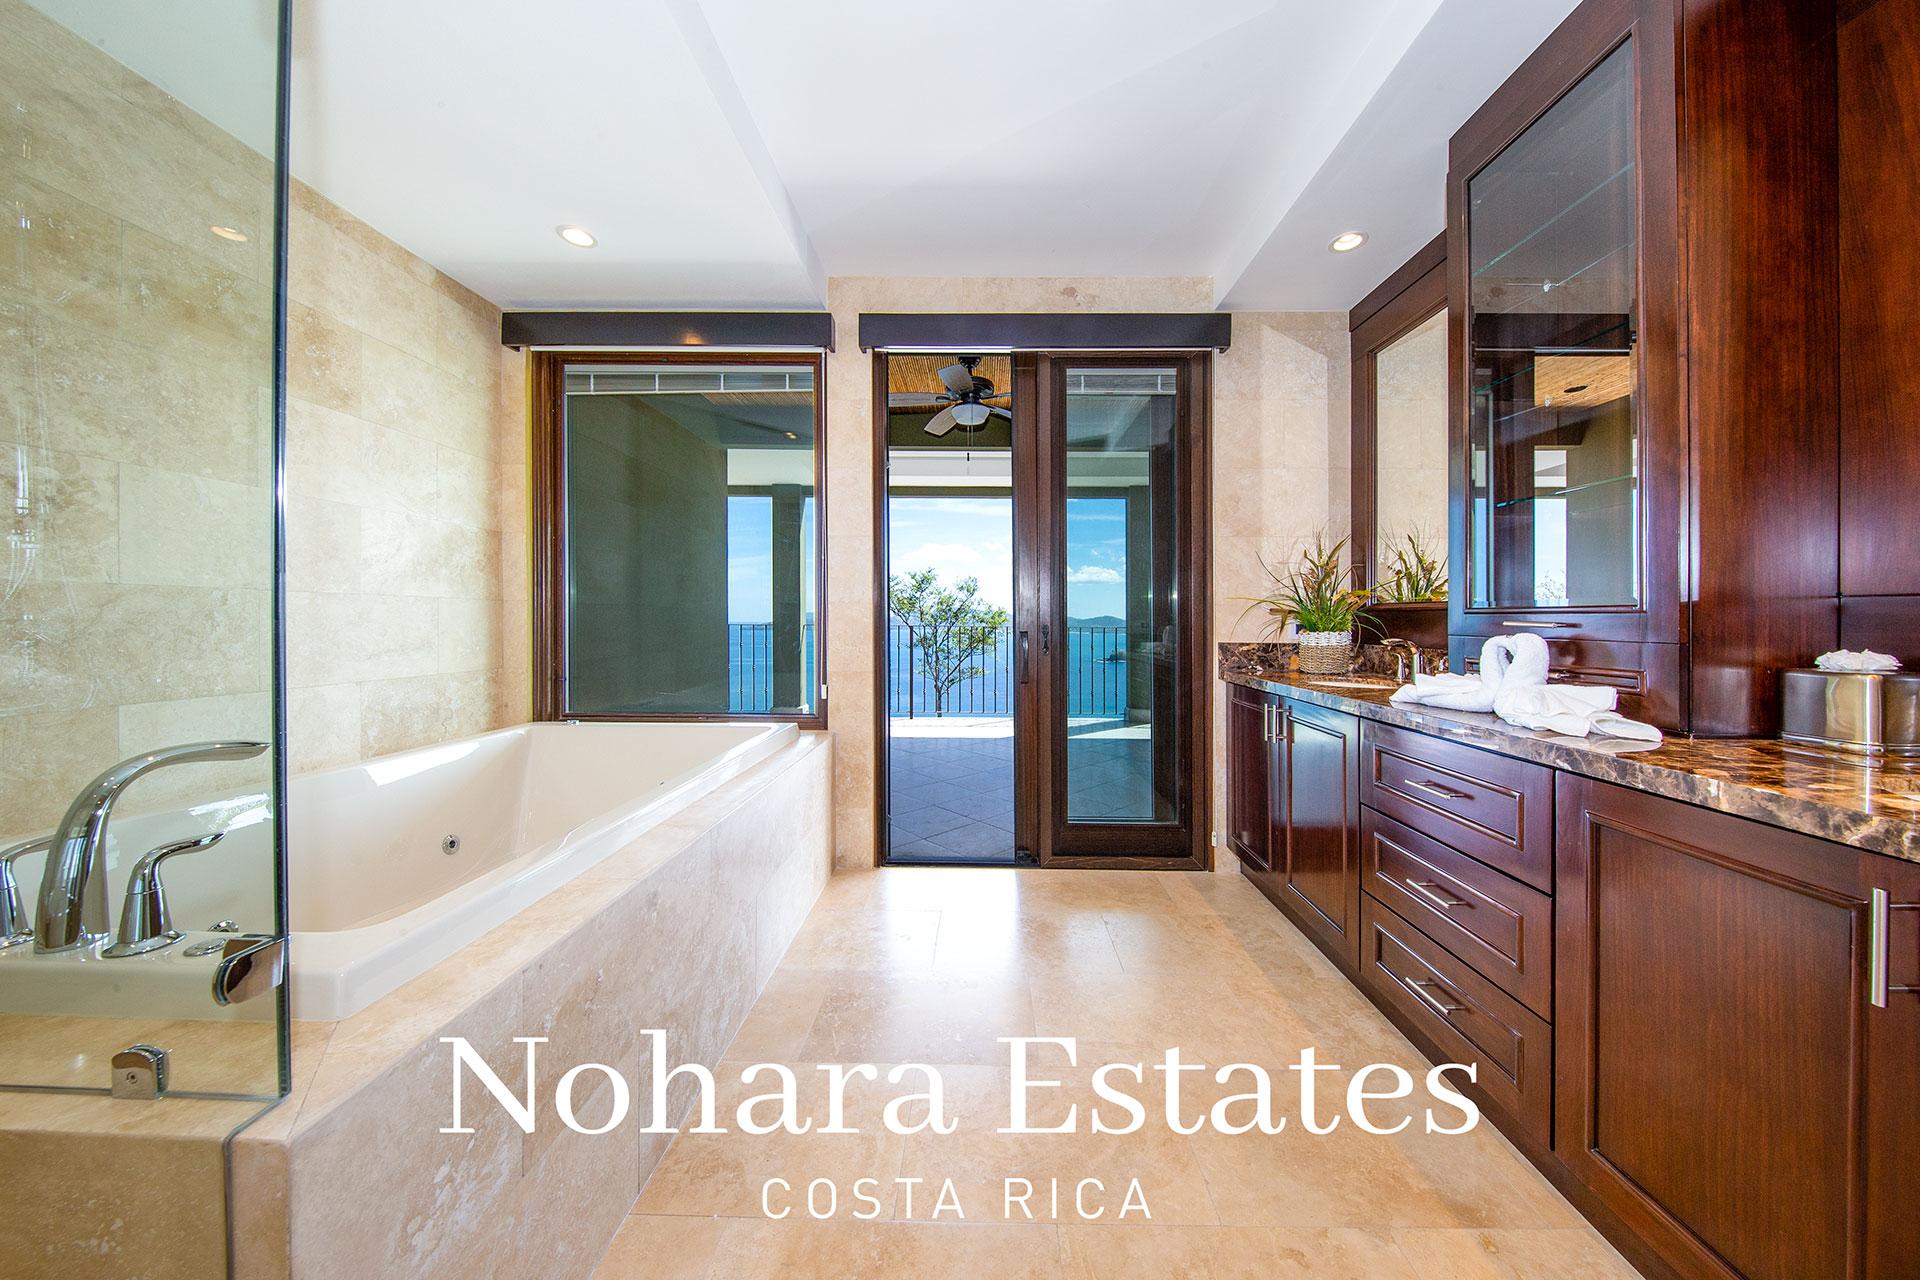 Nohara Estates Costa Rica 360 Esplendor Pacifico Playa Flamingo Penthouse 4